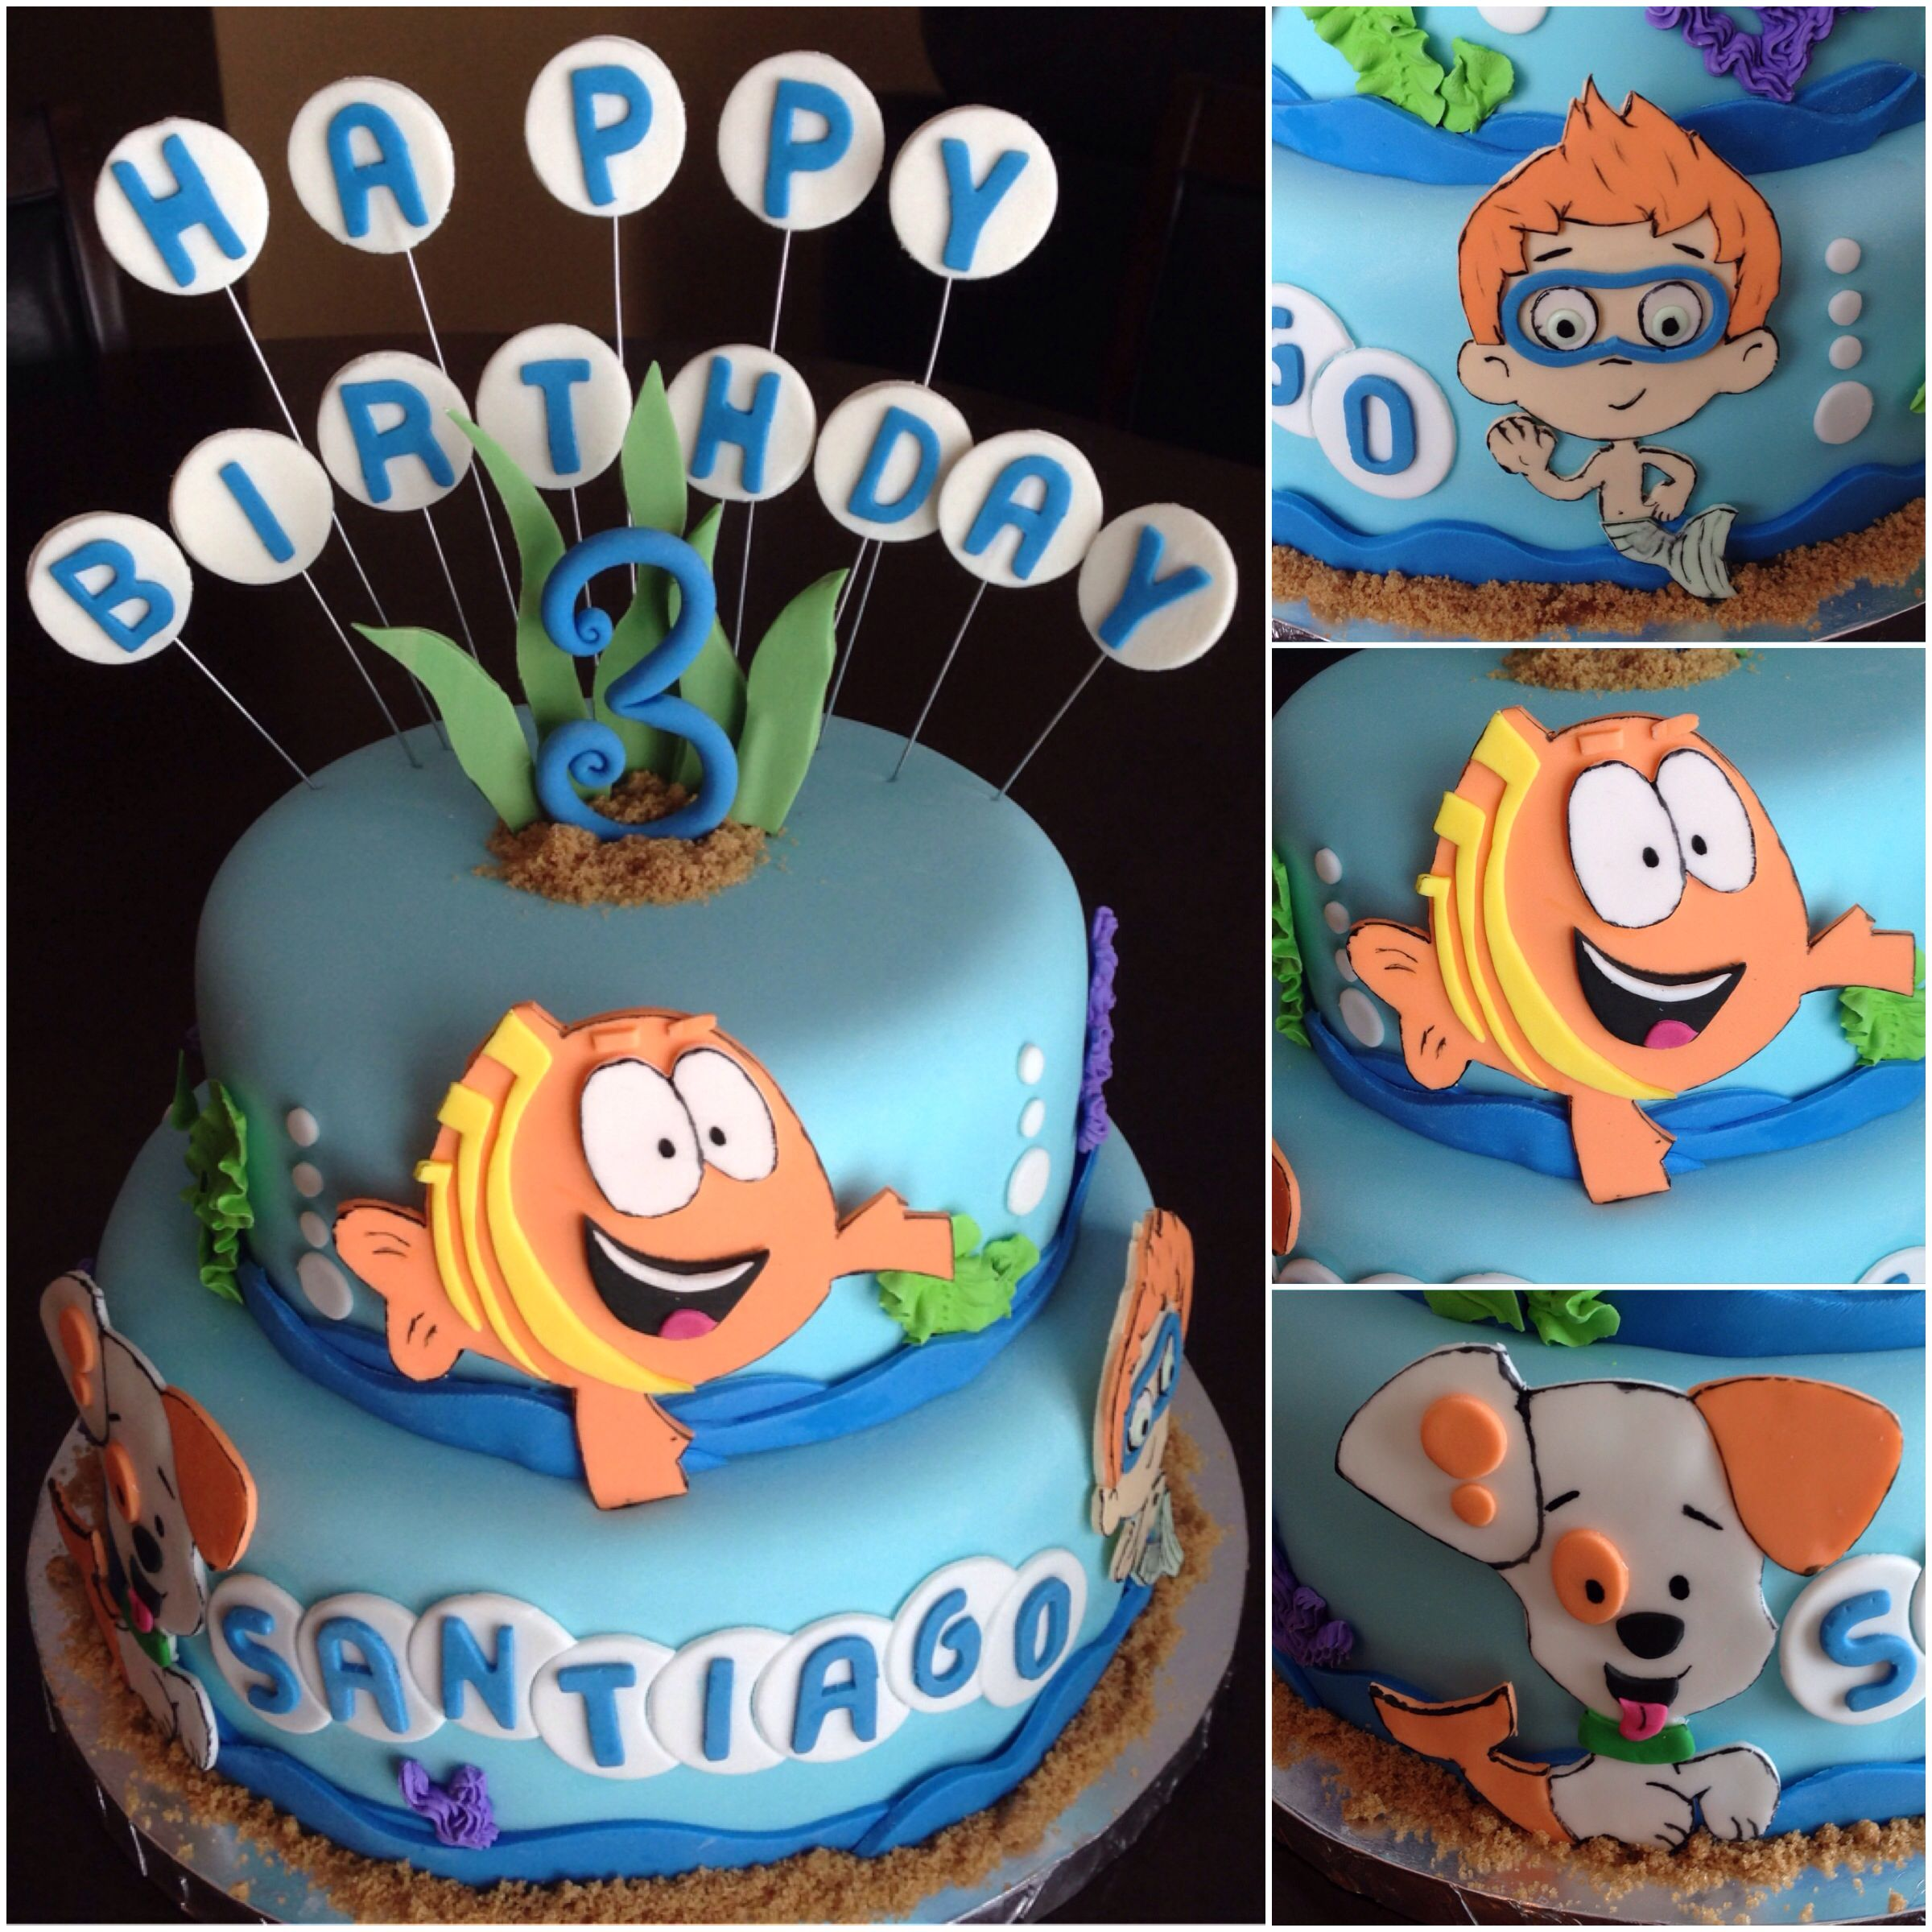 Wondrous Bubble Guppies Birthday Cake With Images Bubble Guppies Birthday Cards Printable Inklcafe Filternl